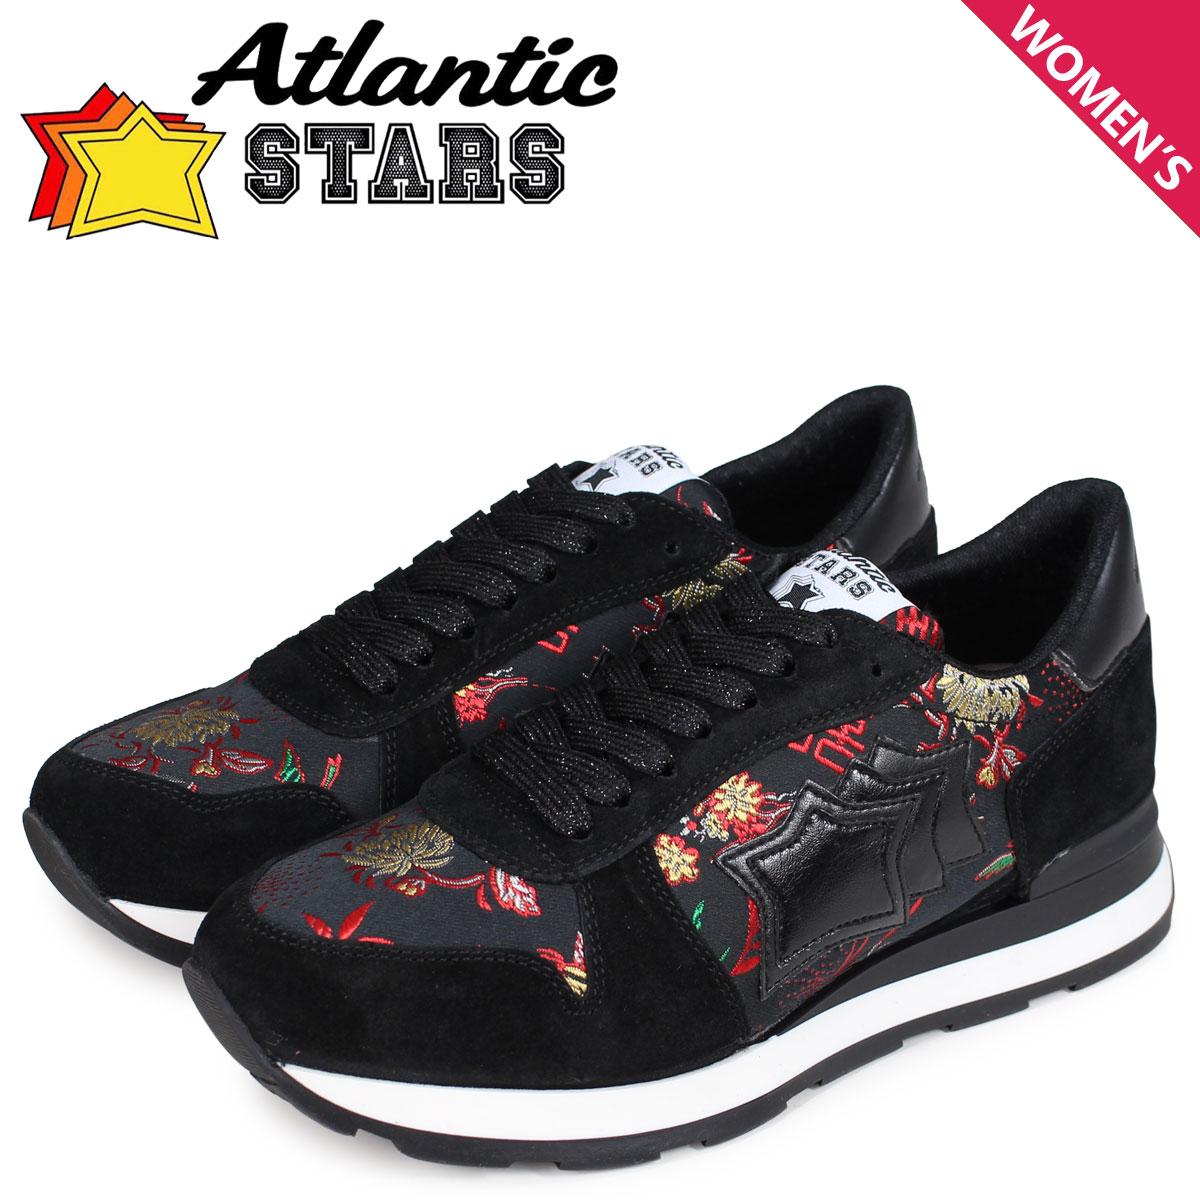 Atlantic STARS レディース スニーカー アトランティックスターズ ベガ VEGA HN-10N ブラック 黒